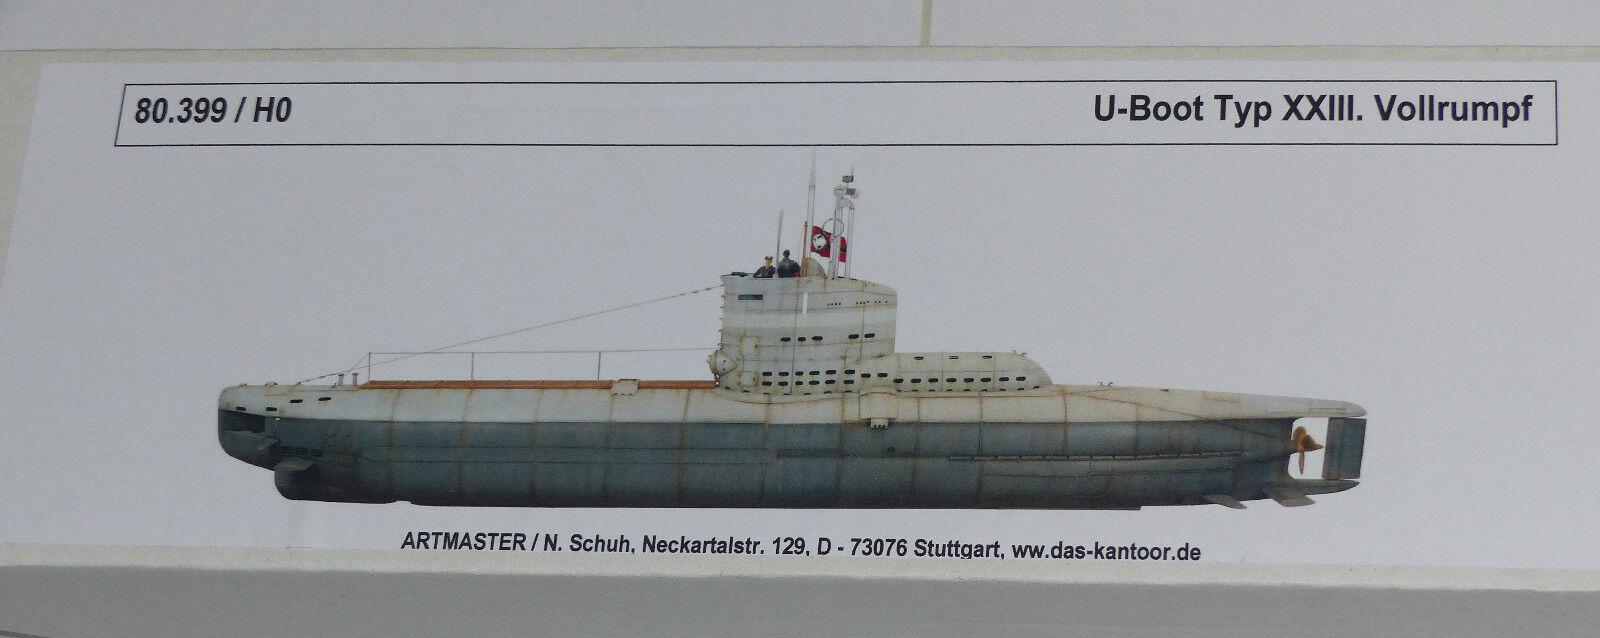 Artmaster 80.399 U-Stiefel Typ XXIII Vollrumpf 1 87 Spur H0 Bausatz Neu   OVP